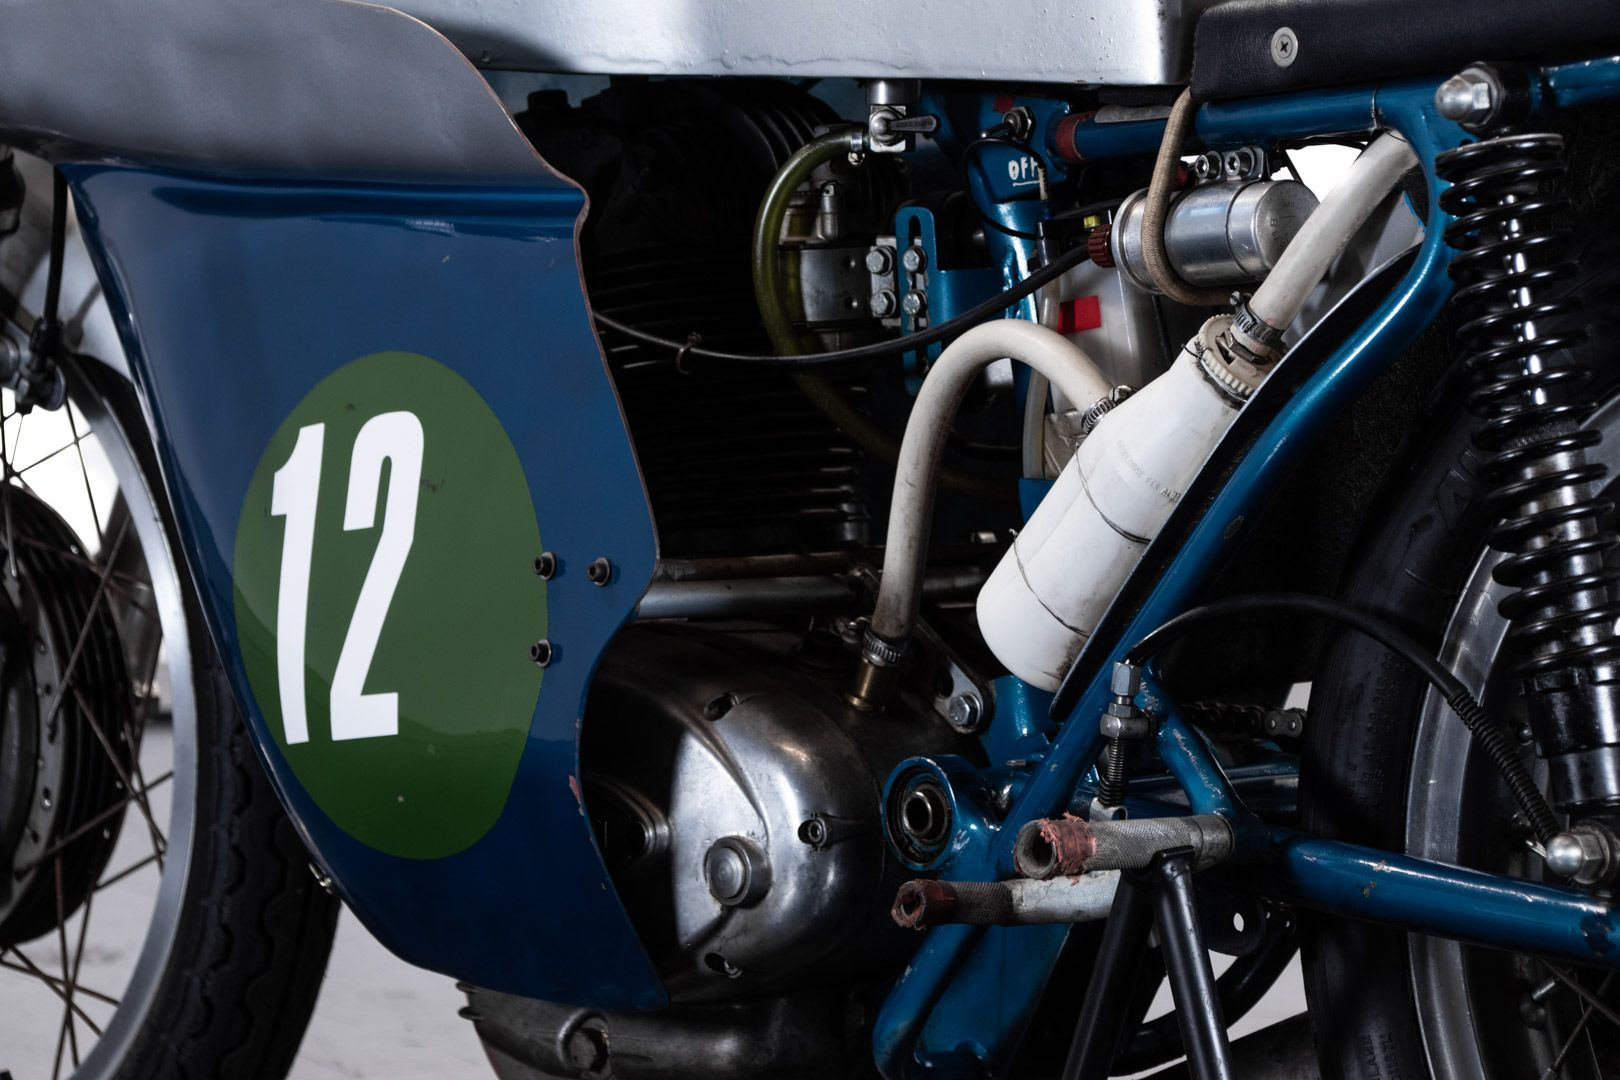 1960 Ducati Mach 1 Corsa NCR 82198